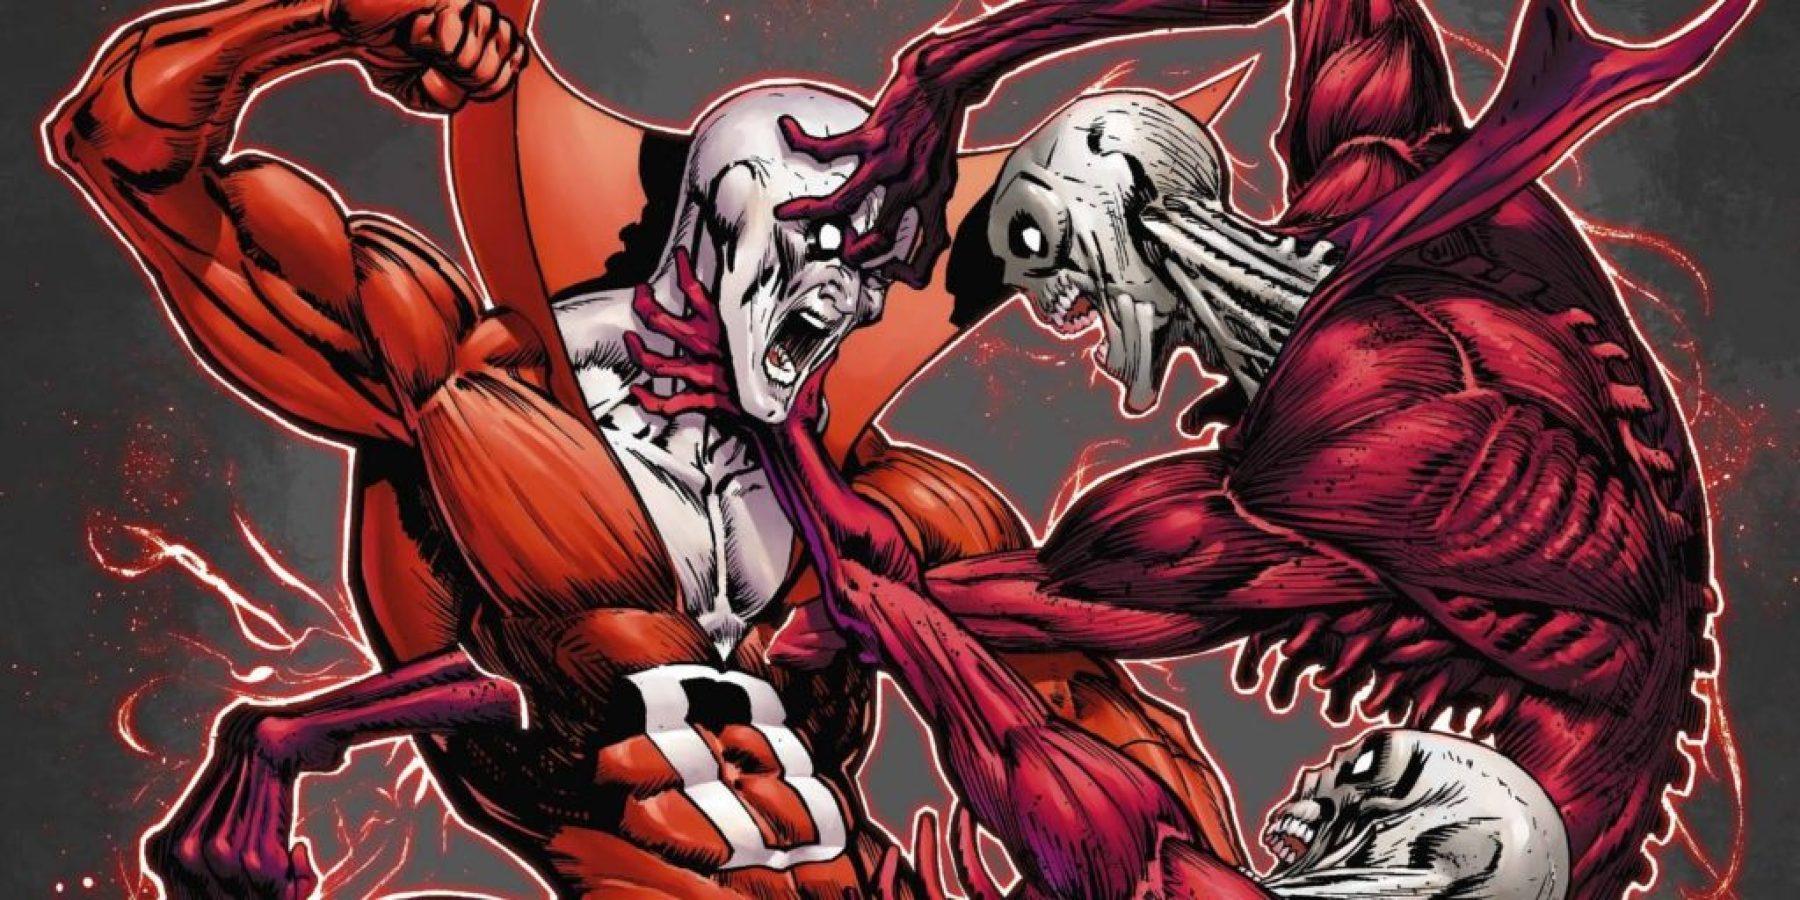 Justice League Dark comics starring Deadman